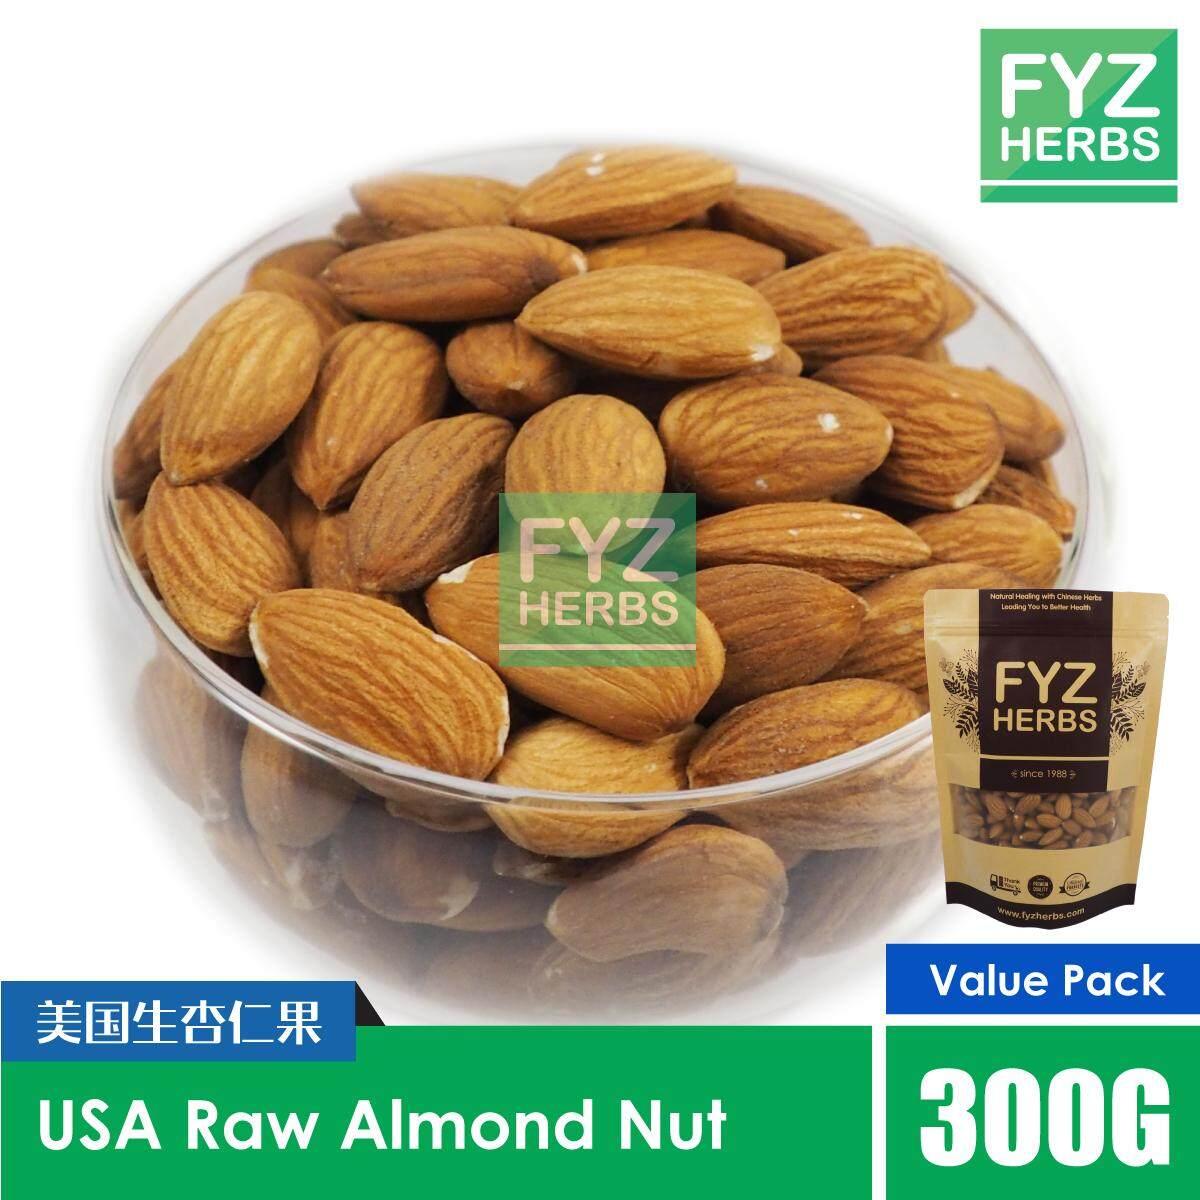 FYZ Herbs USA Raw Almond Nut - Not Roasted / Kacang Badam 300G [Value Pack] 美国生杏仁果袋装 300G